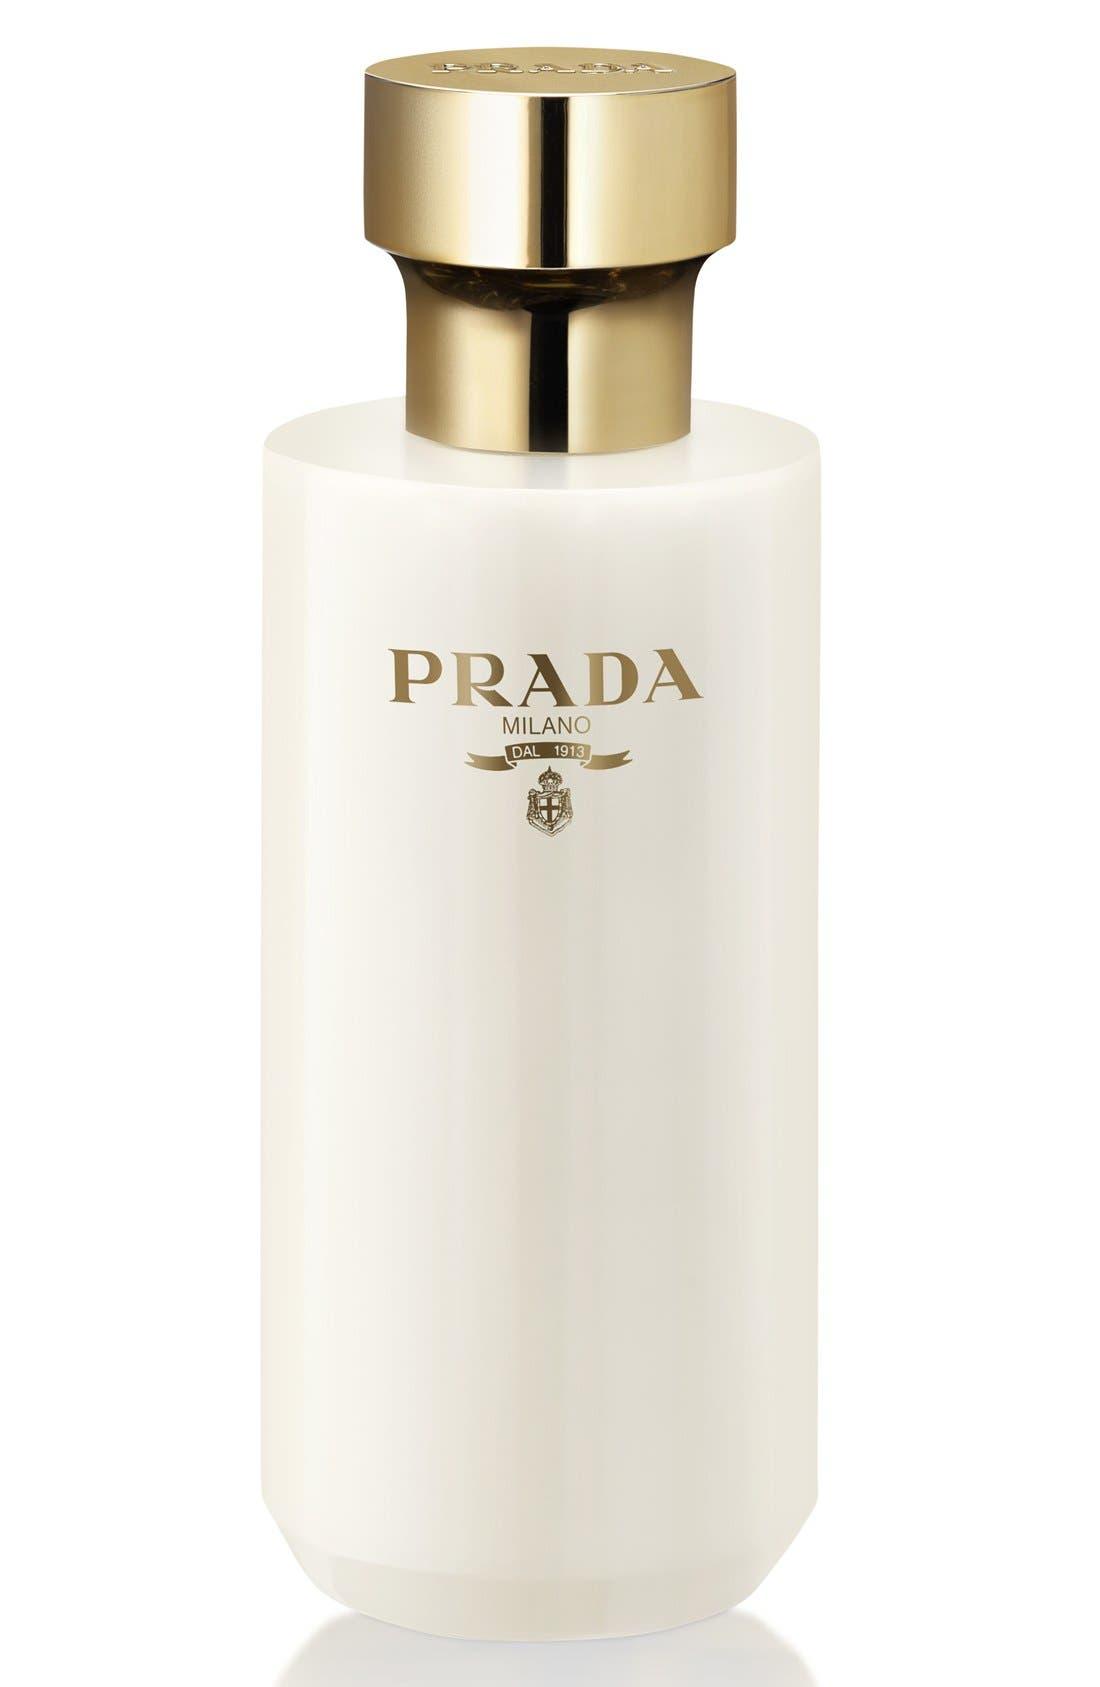 Prada 'La Femme Prada' Satin Body Lotion